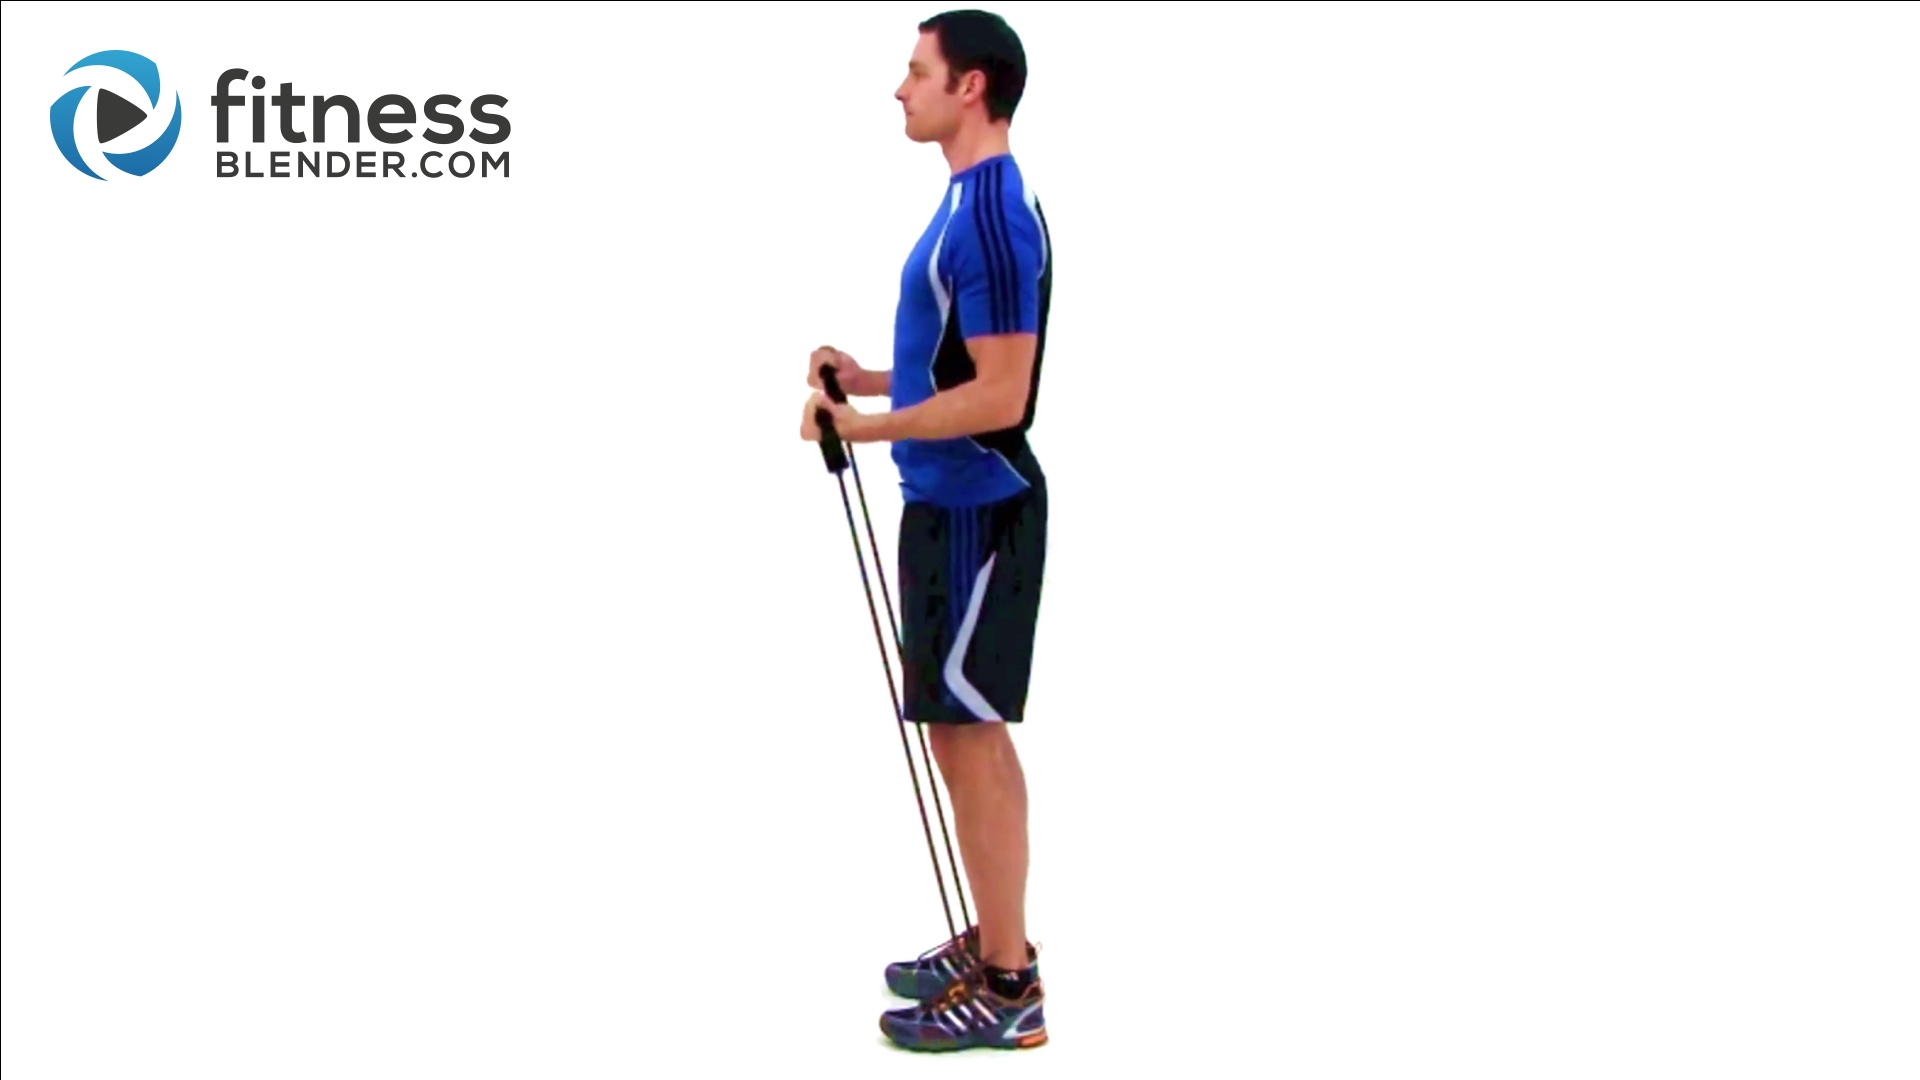 16 Minute Bicep Tricep Super Set Workout Resistance Band Exercises Fitness Blender